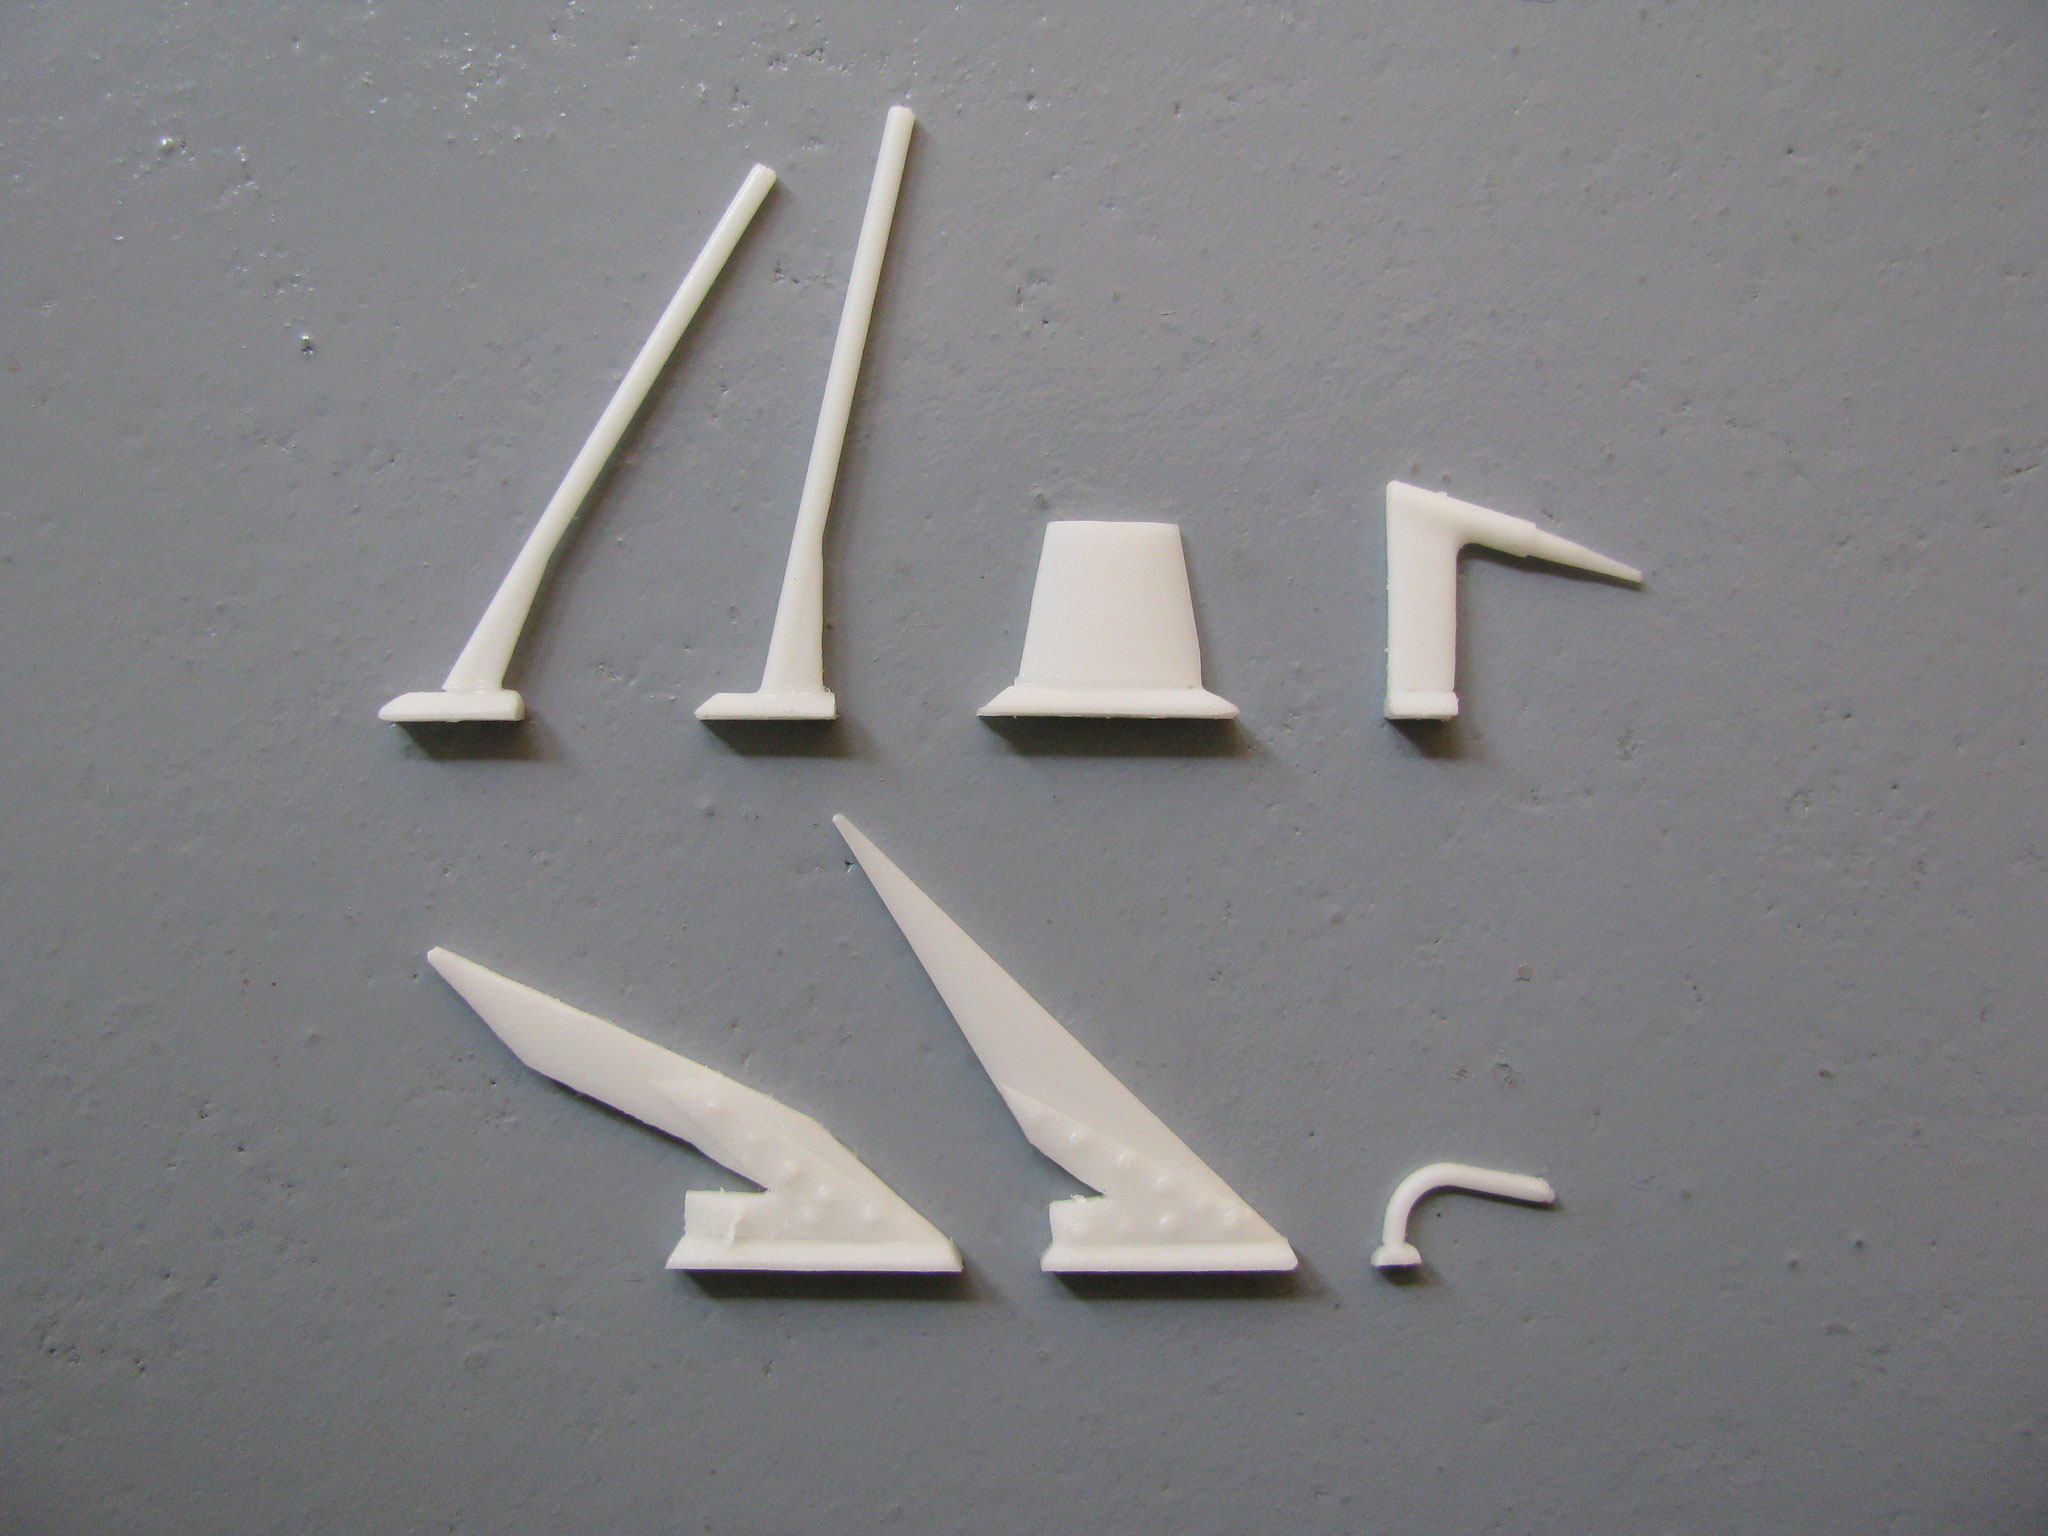 Scaleteile